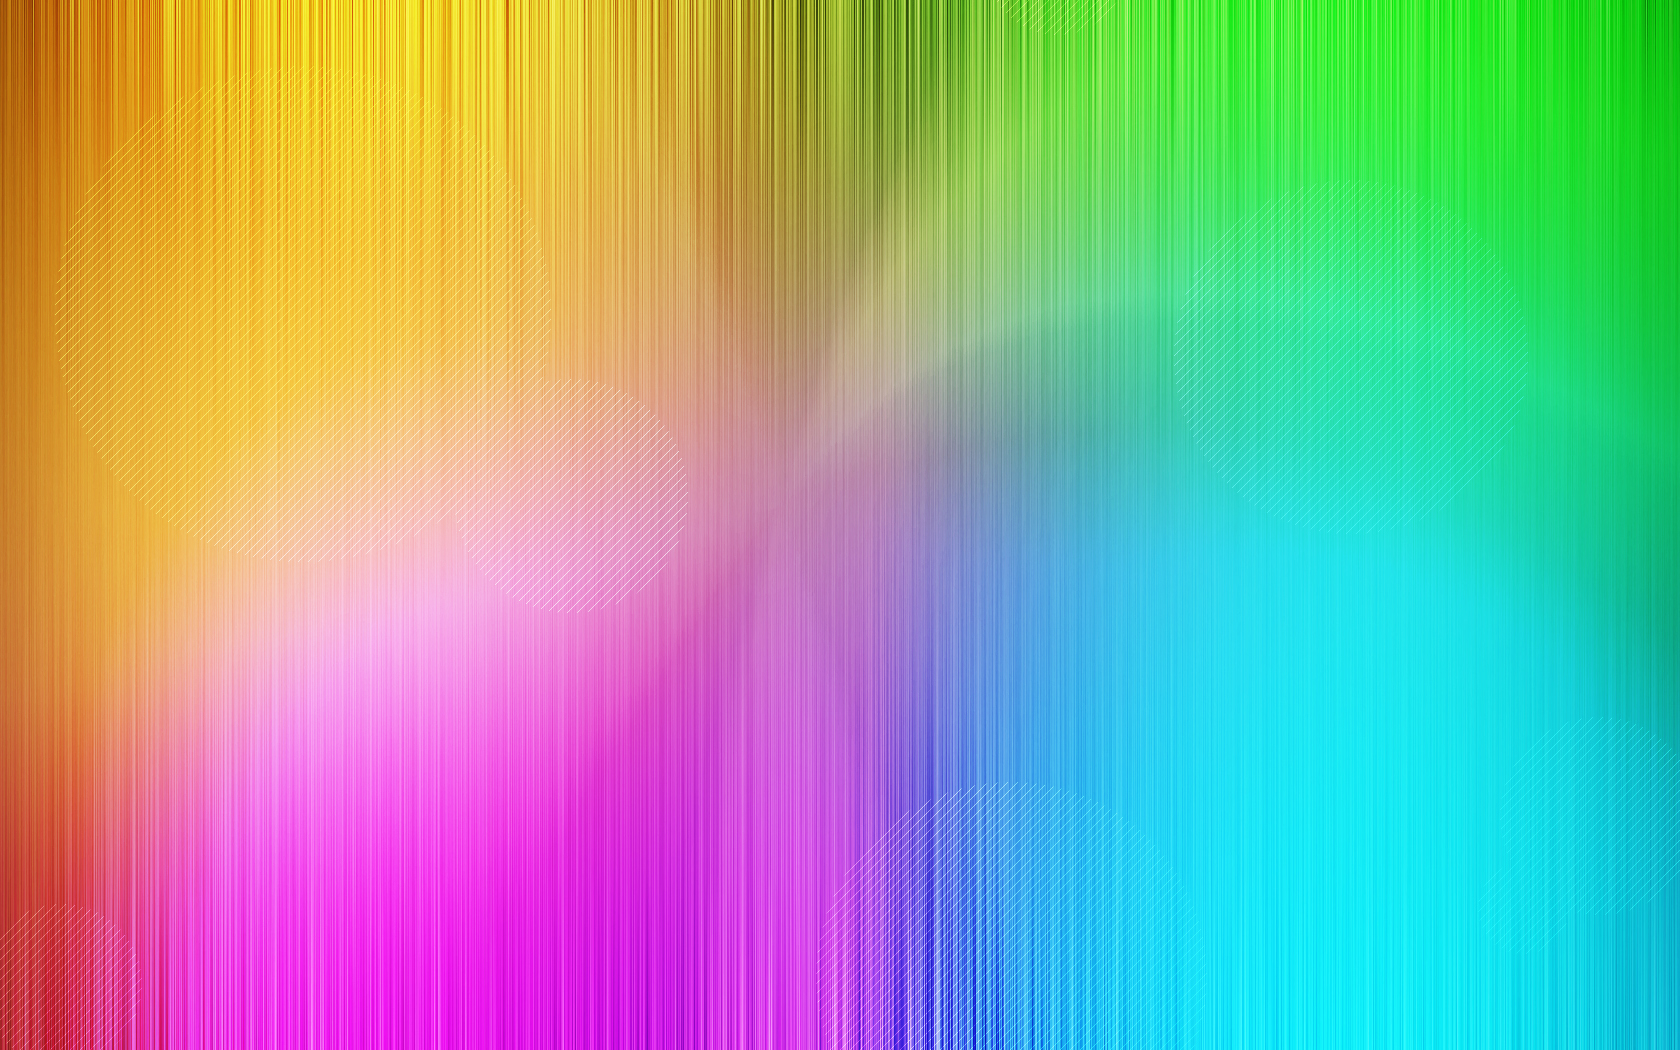 download colors hd wallpaper - photo #3